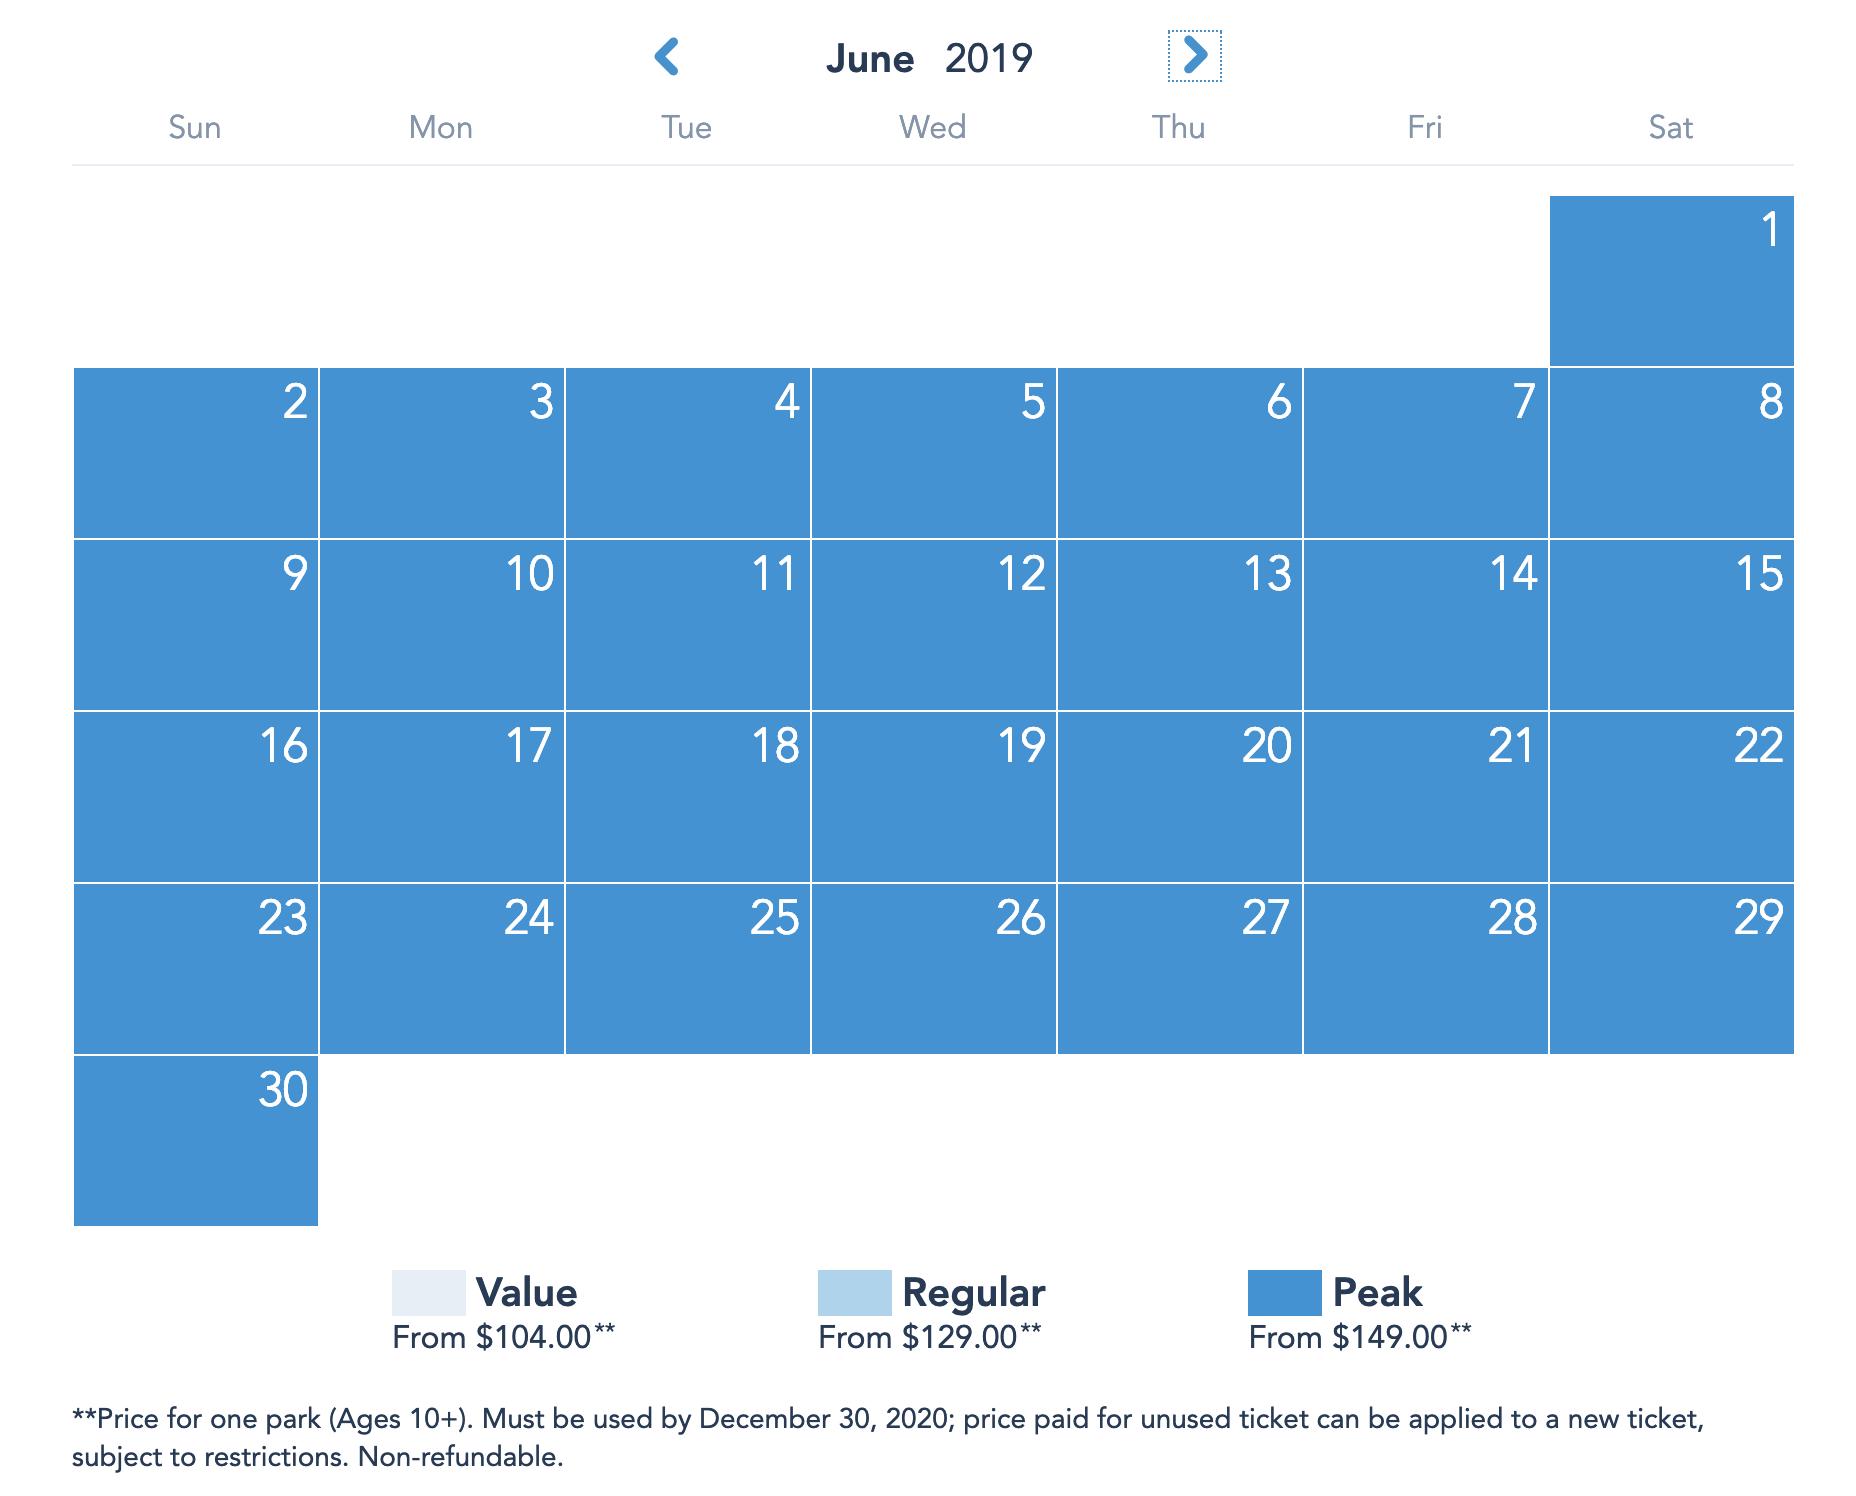 Disneyland Resort Prices - June